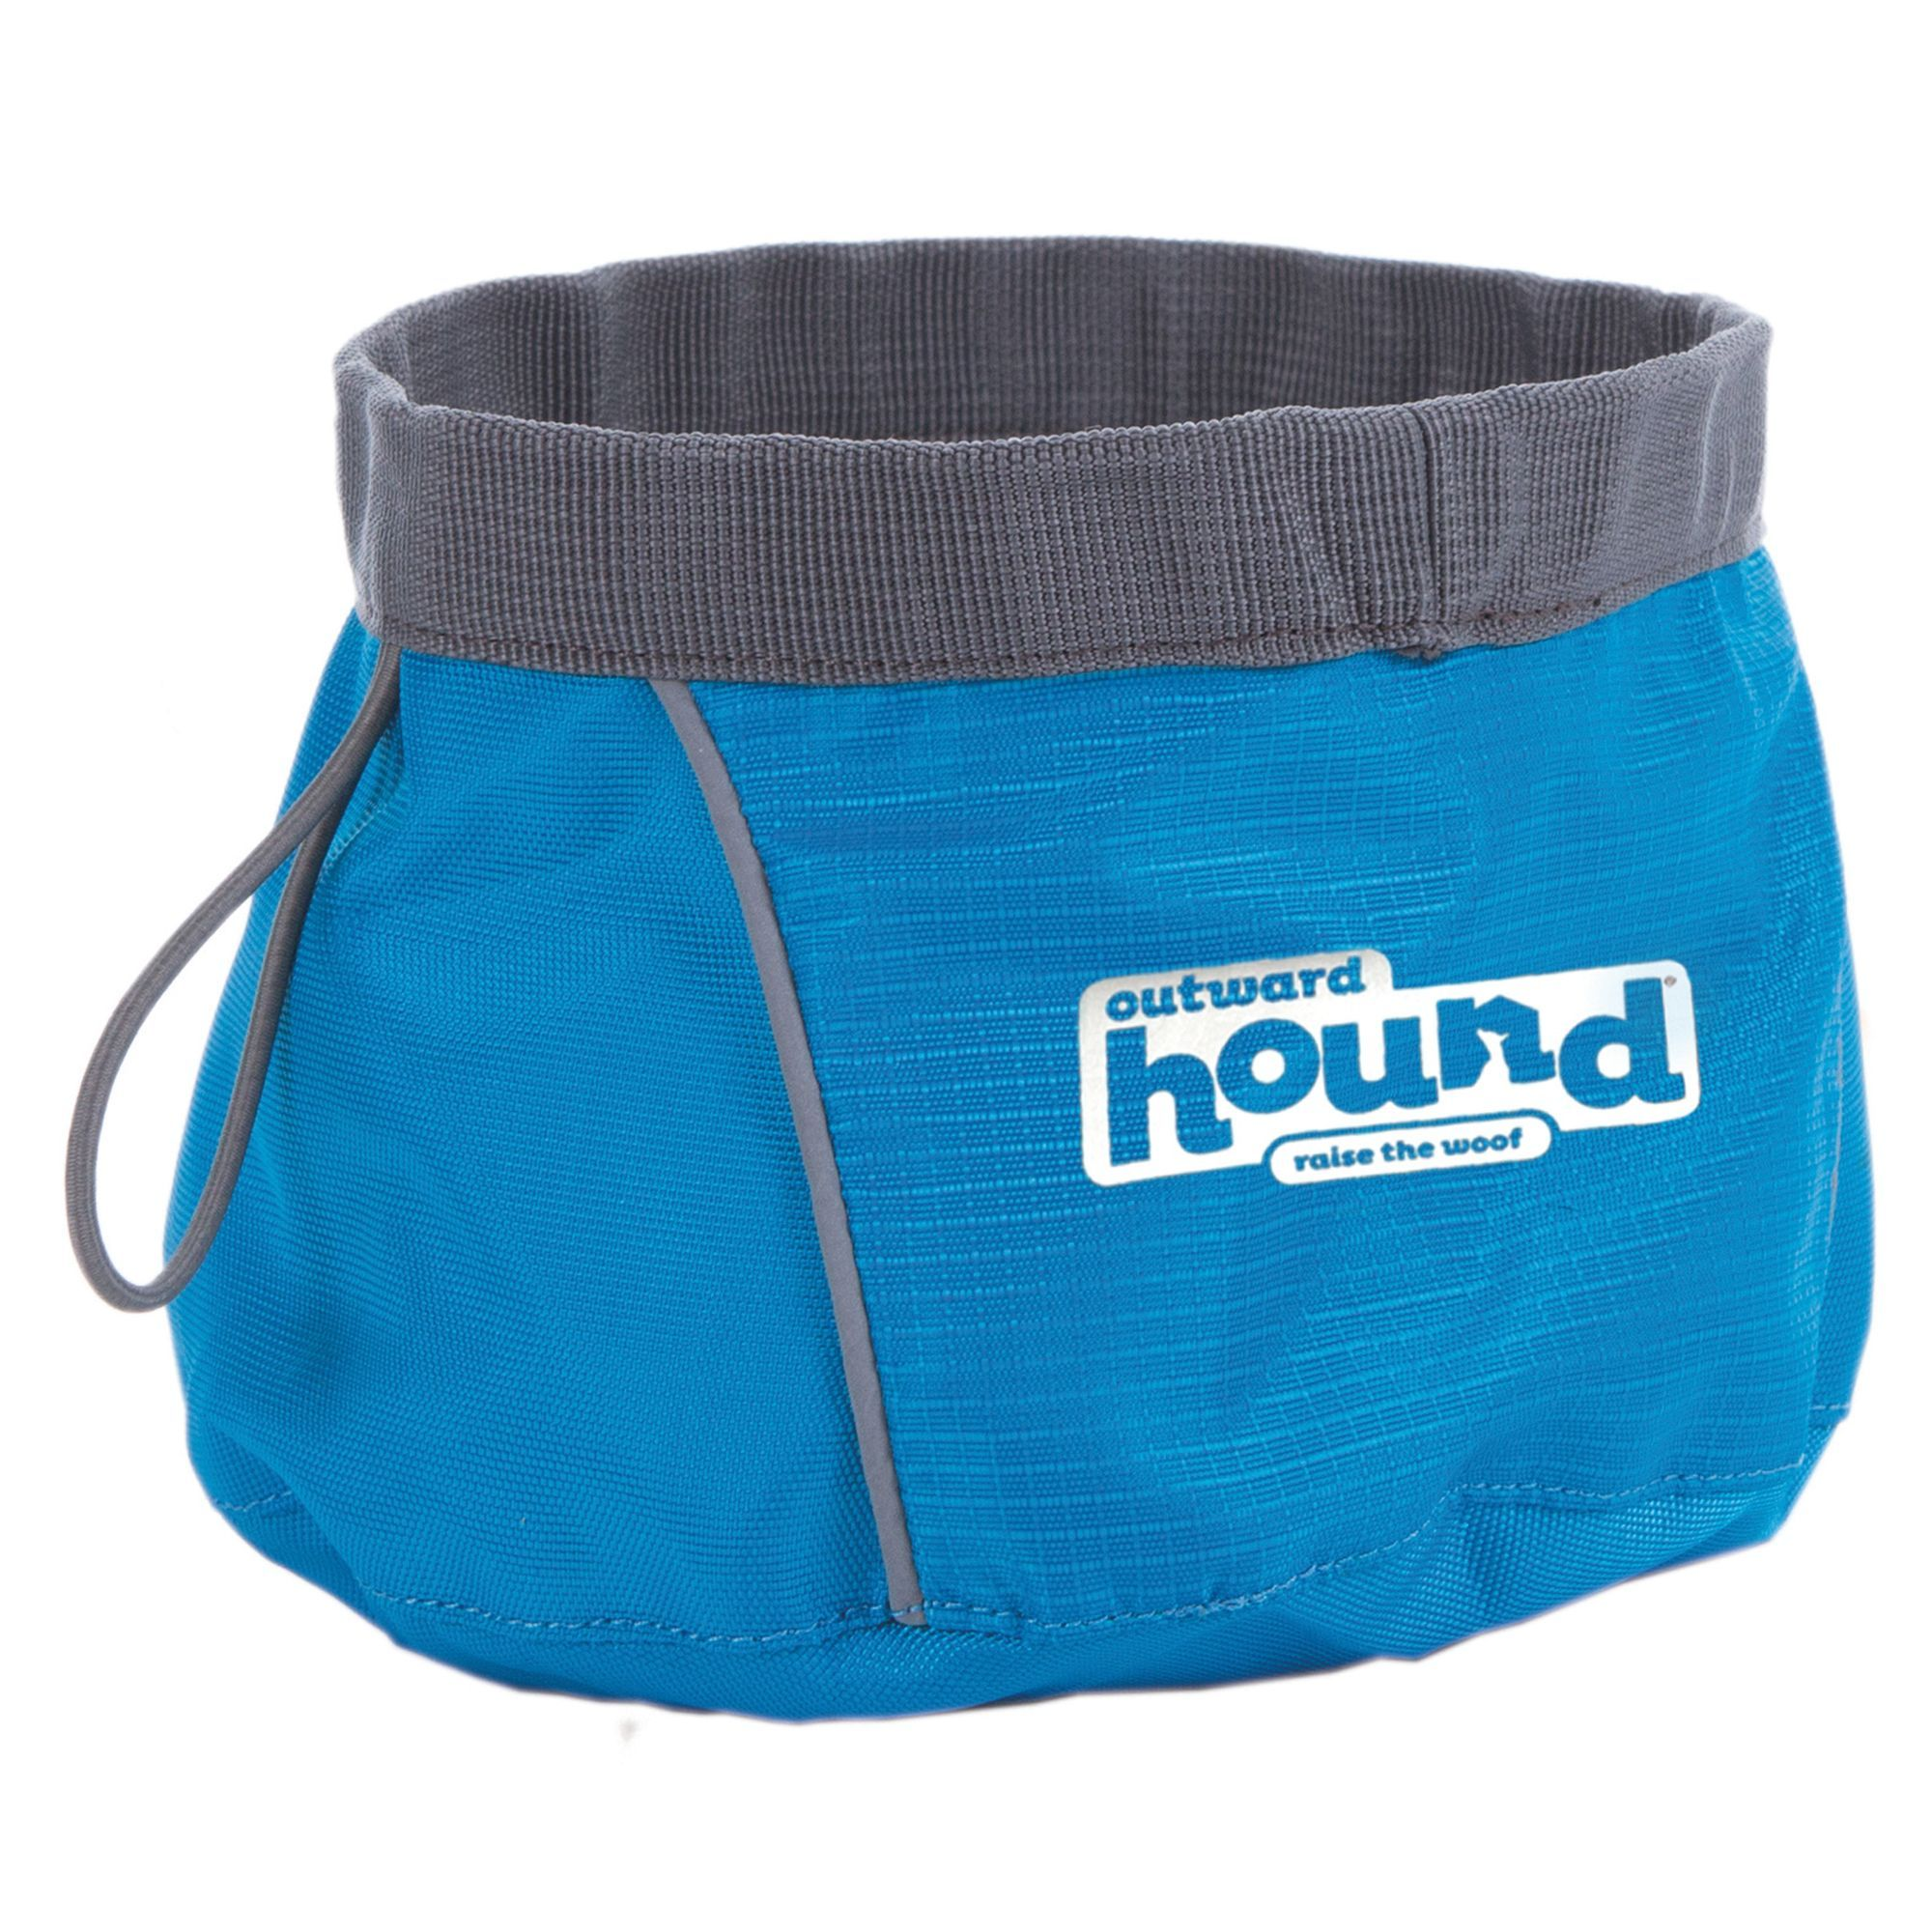 Outward hound portabowl collapsible dog bowl dog